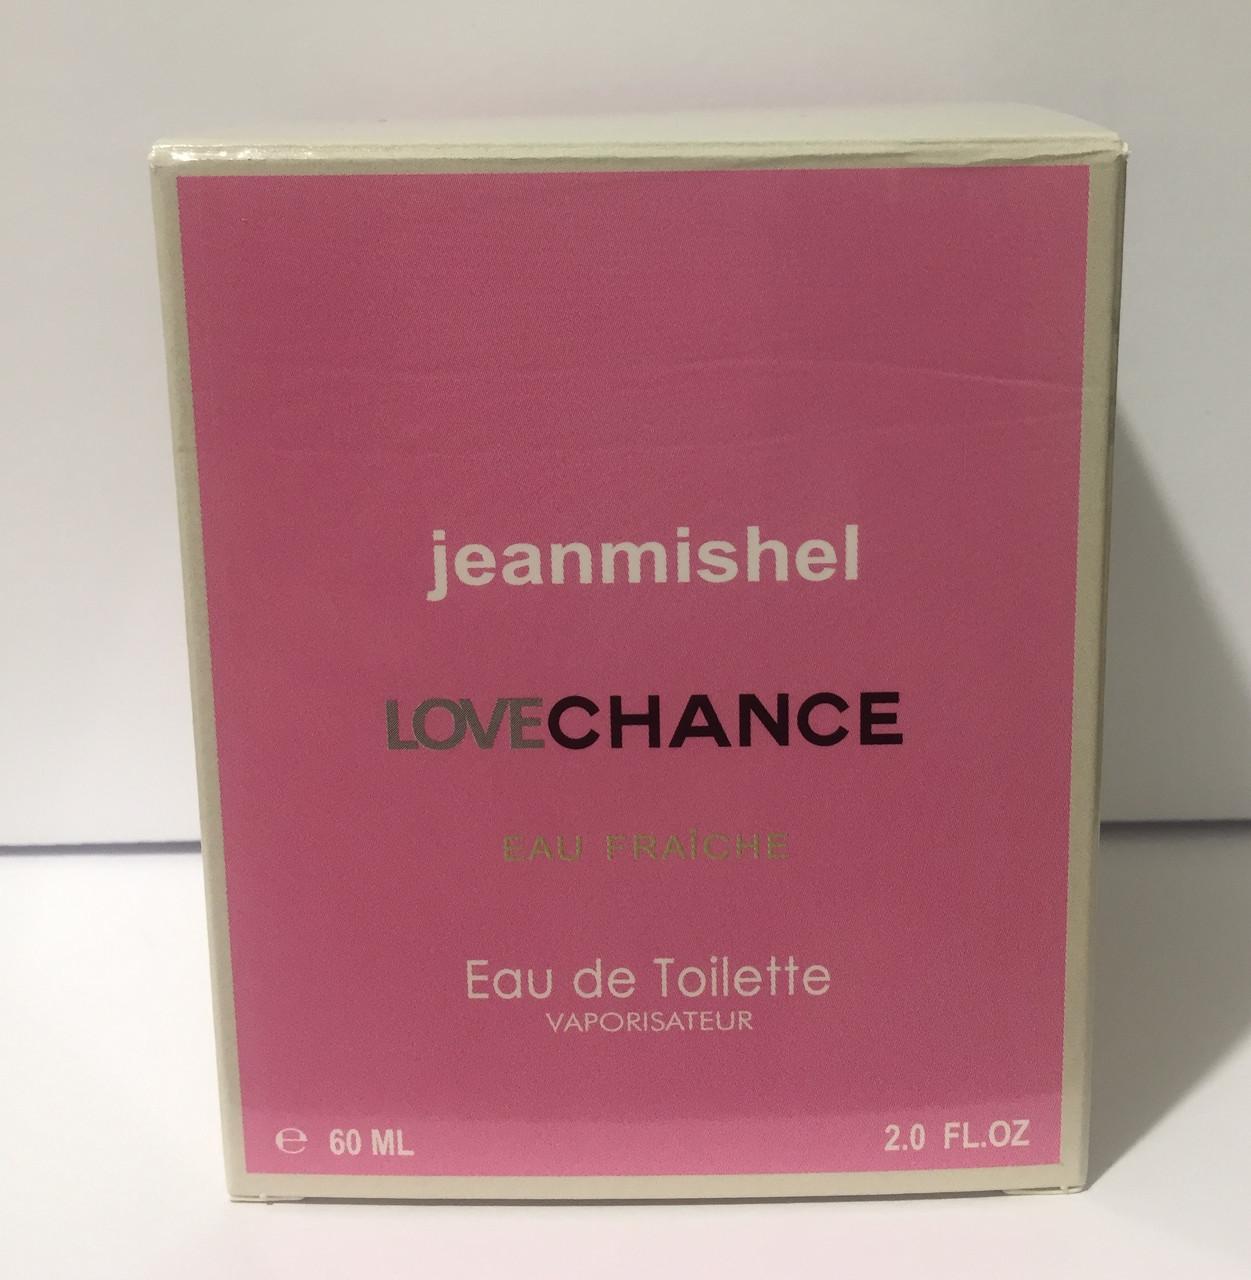 Тестер в подарочной упаковке jeanmishel Love Chance eau Fraiche 60 мл